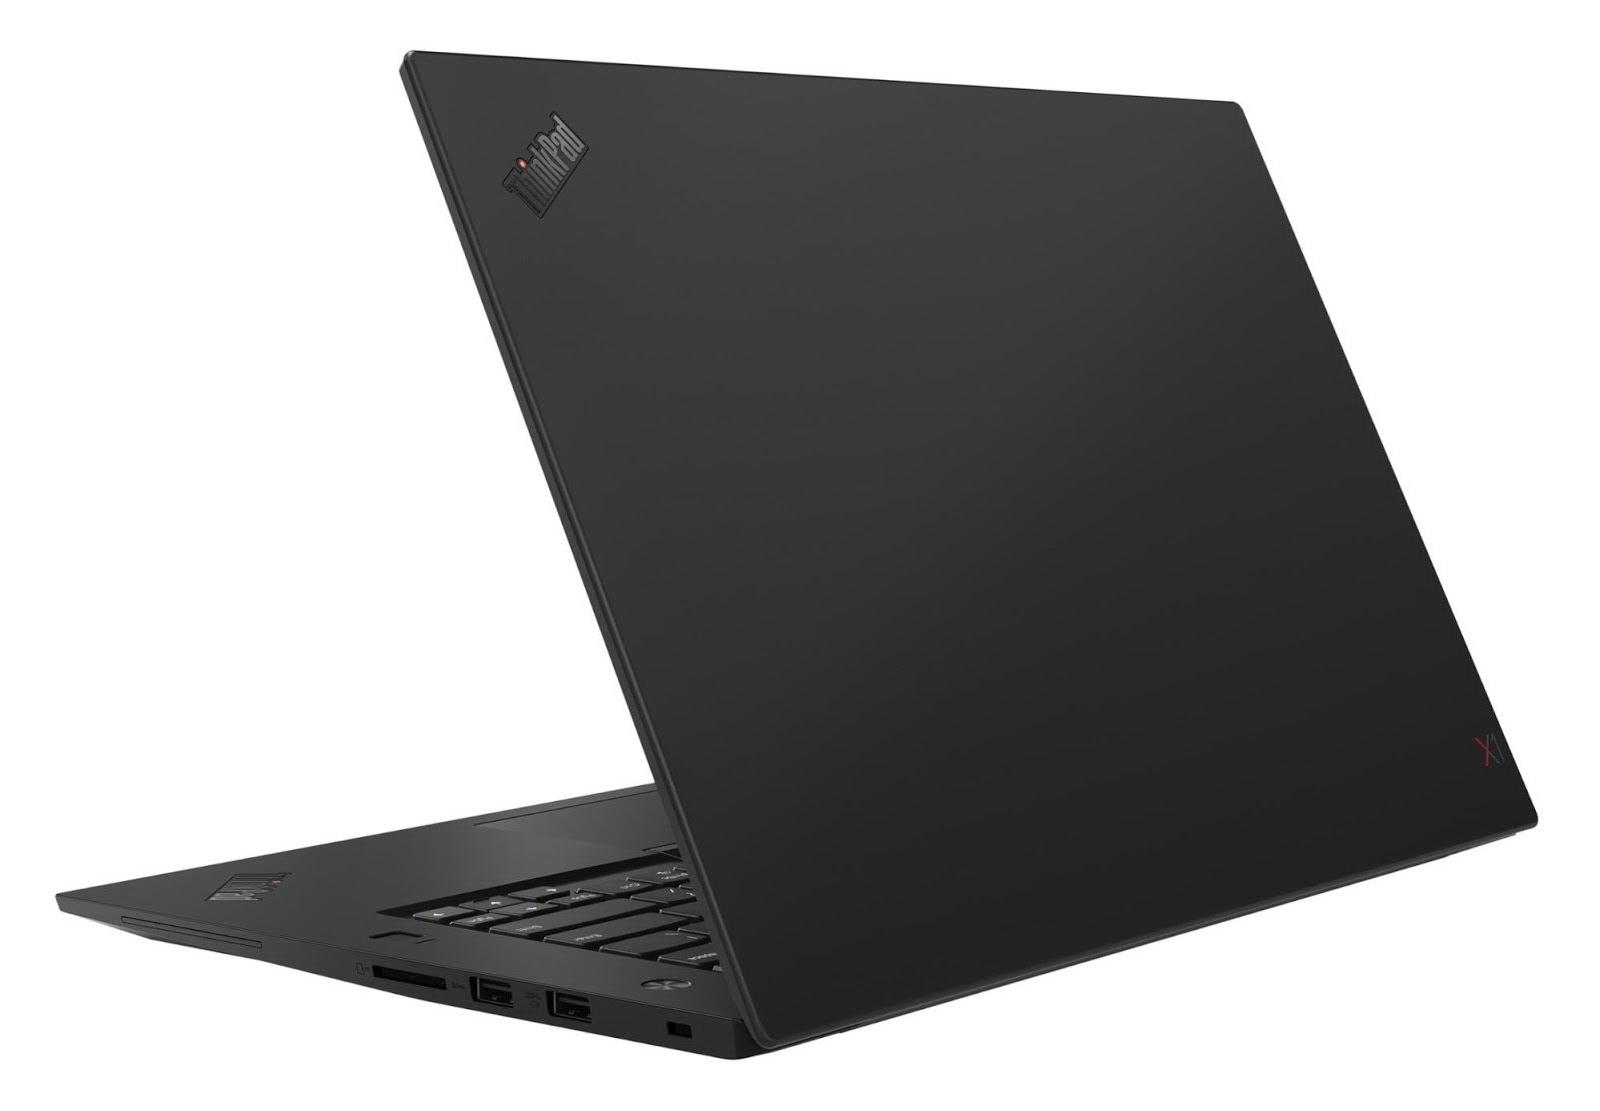 Фото 1. Ноутбук Lenovo ThinkPad X1 Extreme 2nd Gen (20QWS1GL00)